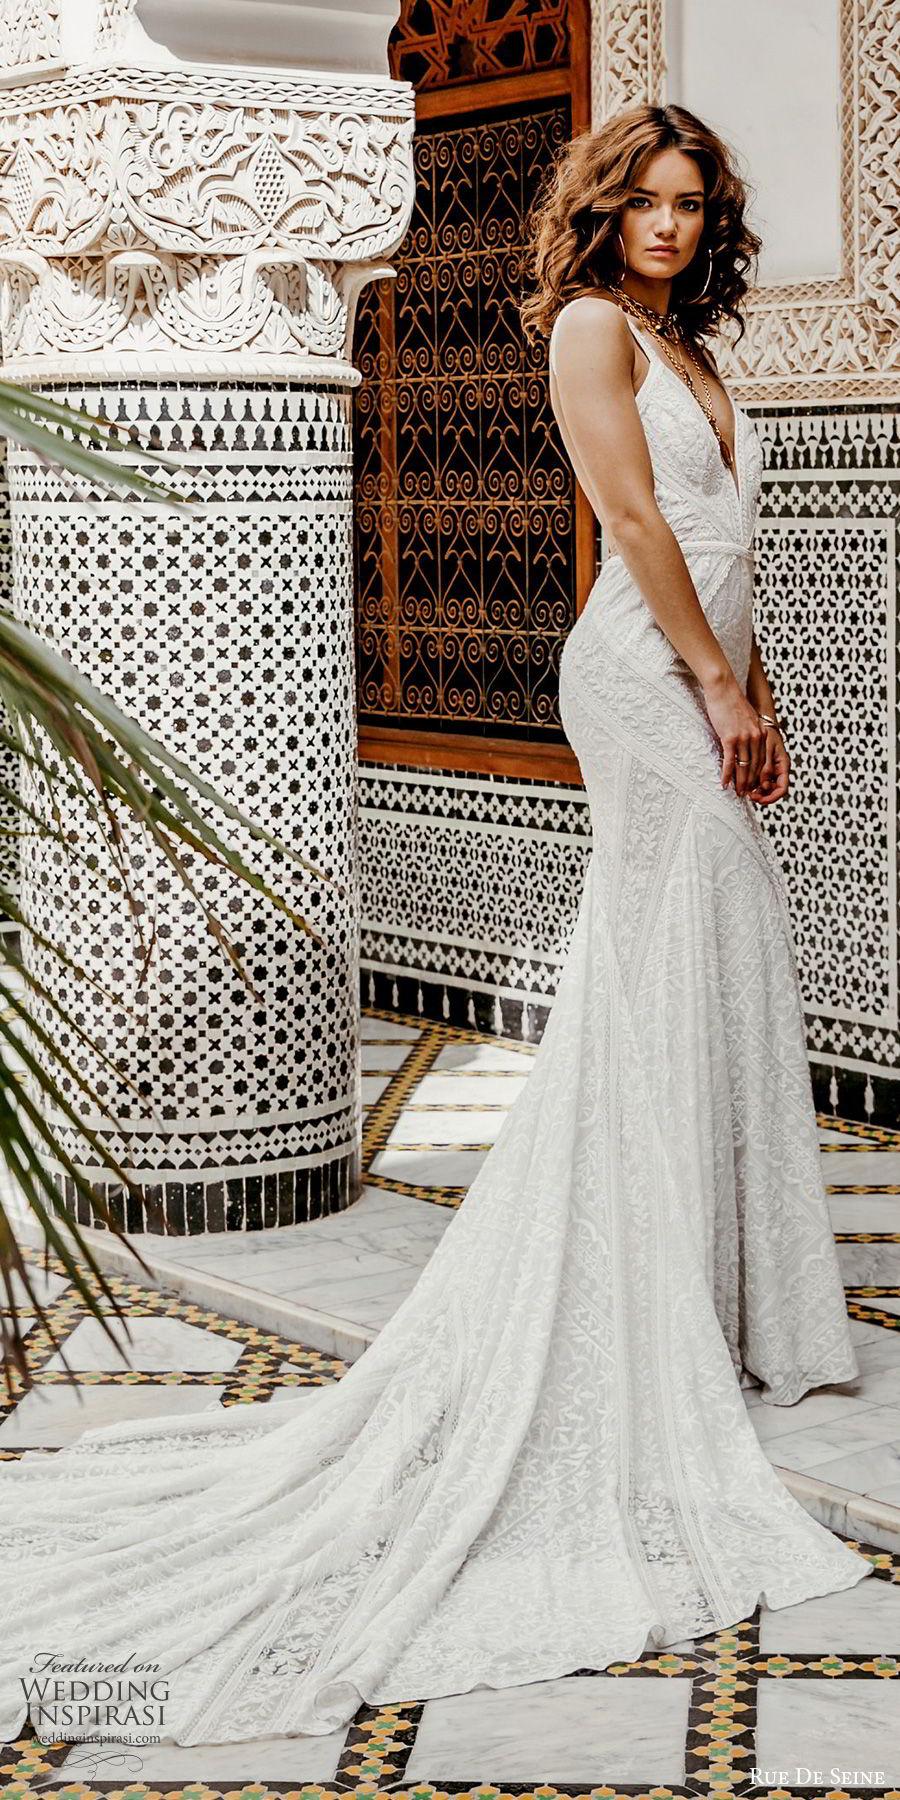 rue de seine 2019 bridal sleeveless thick straps deep v neckline lace fit flare sheath wedding dress (11) boho chic romantic open back chapel train mv